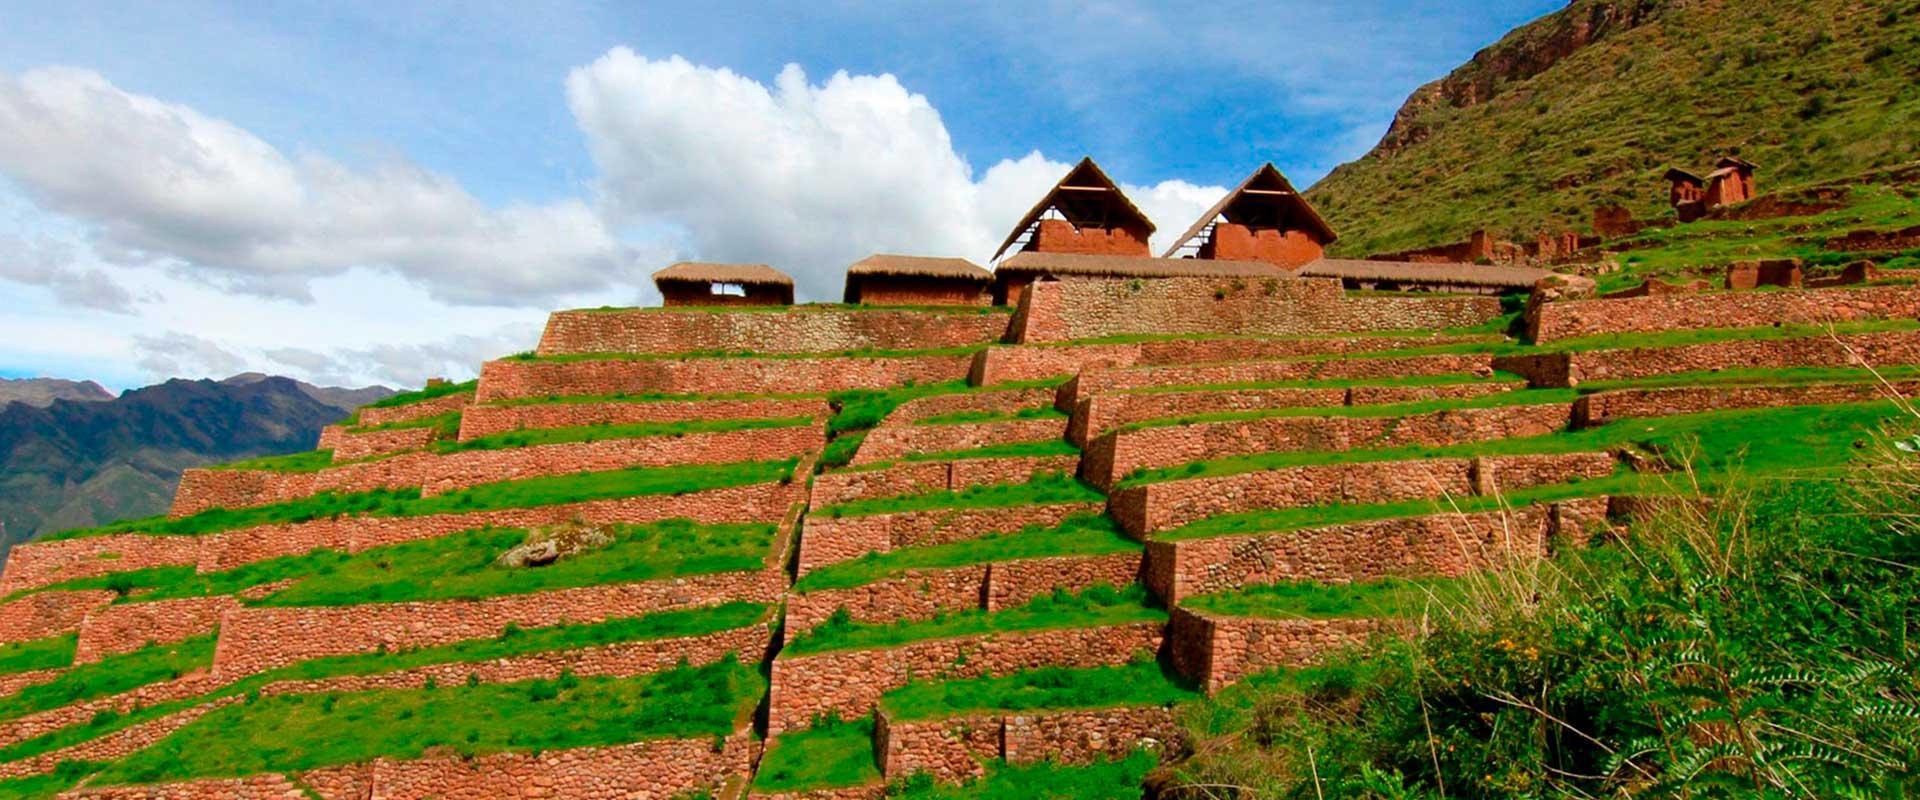 Huchuy Qosqo on Horseback & Machu Picchu